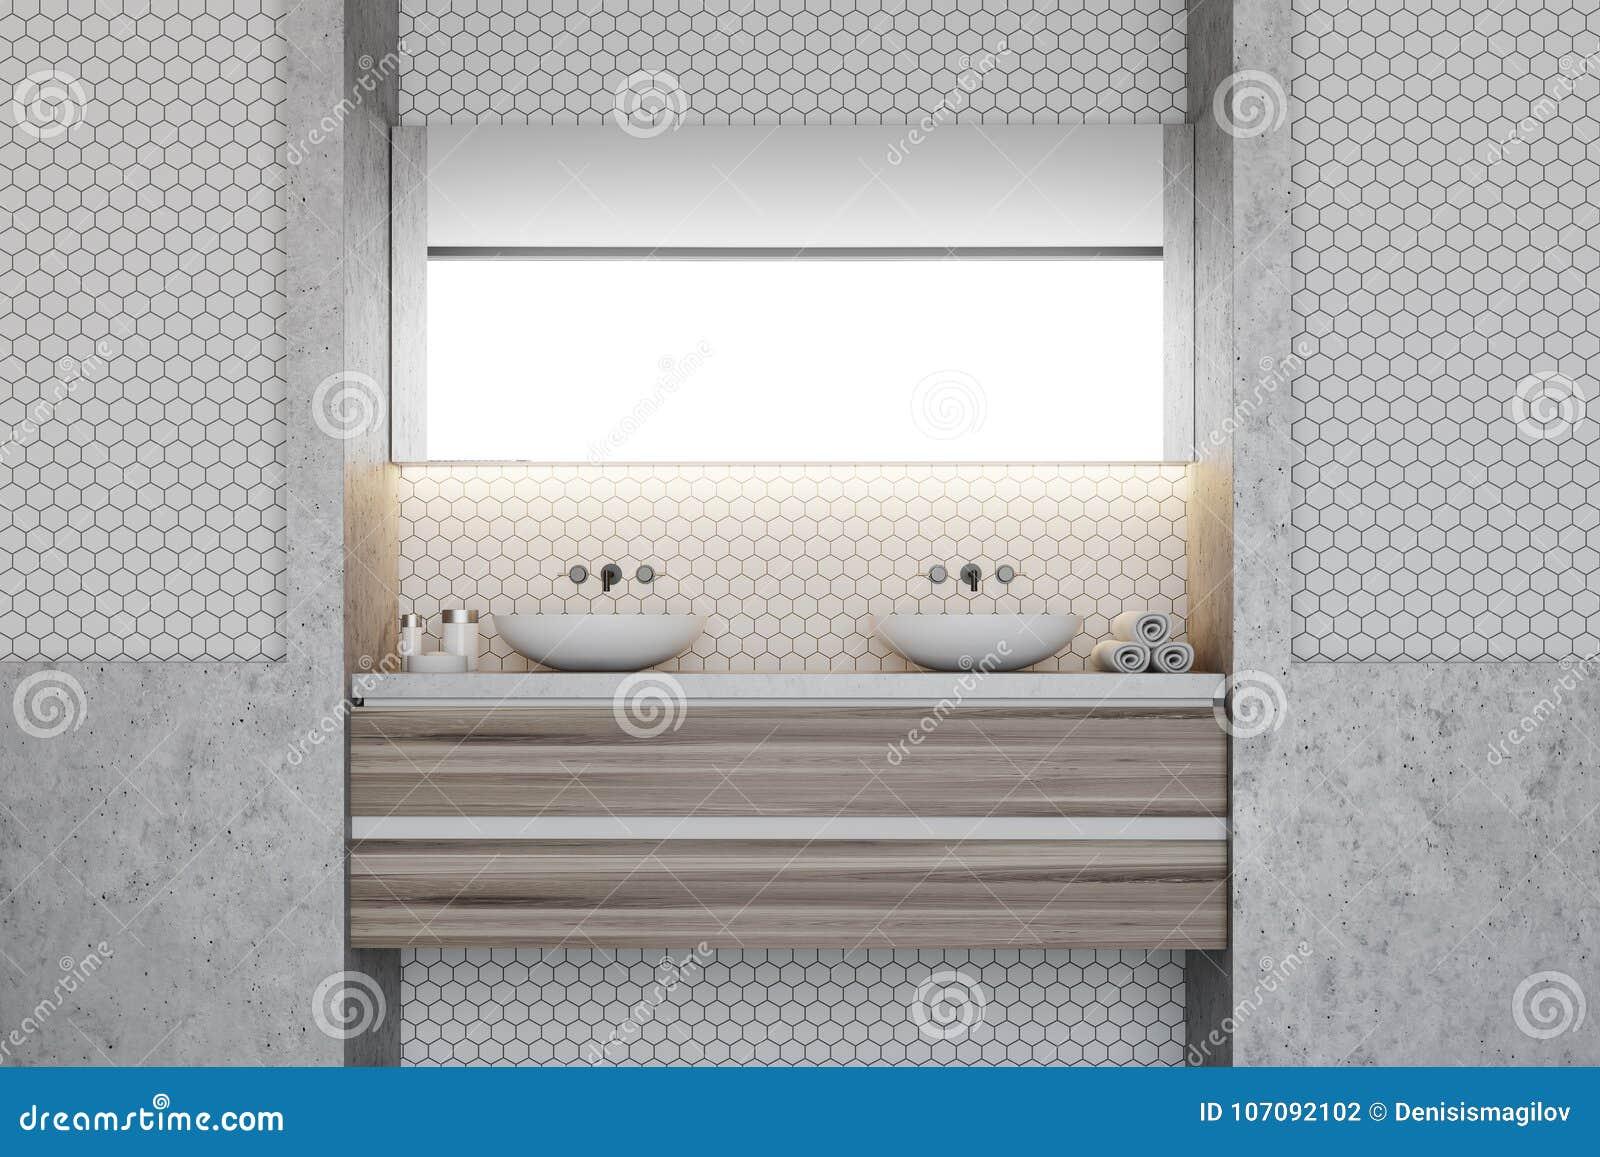 Hexagon Tile Bathroom, Double Sink Stock Illustration - Illustration ...